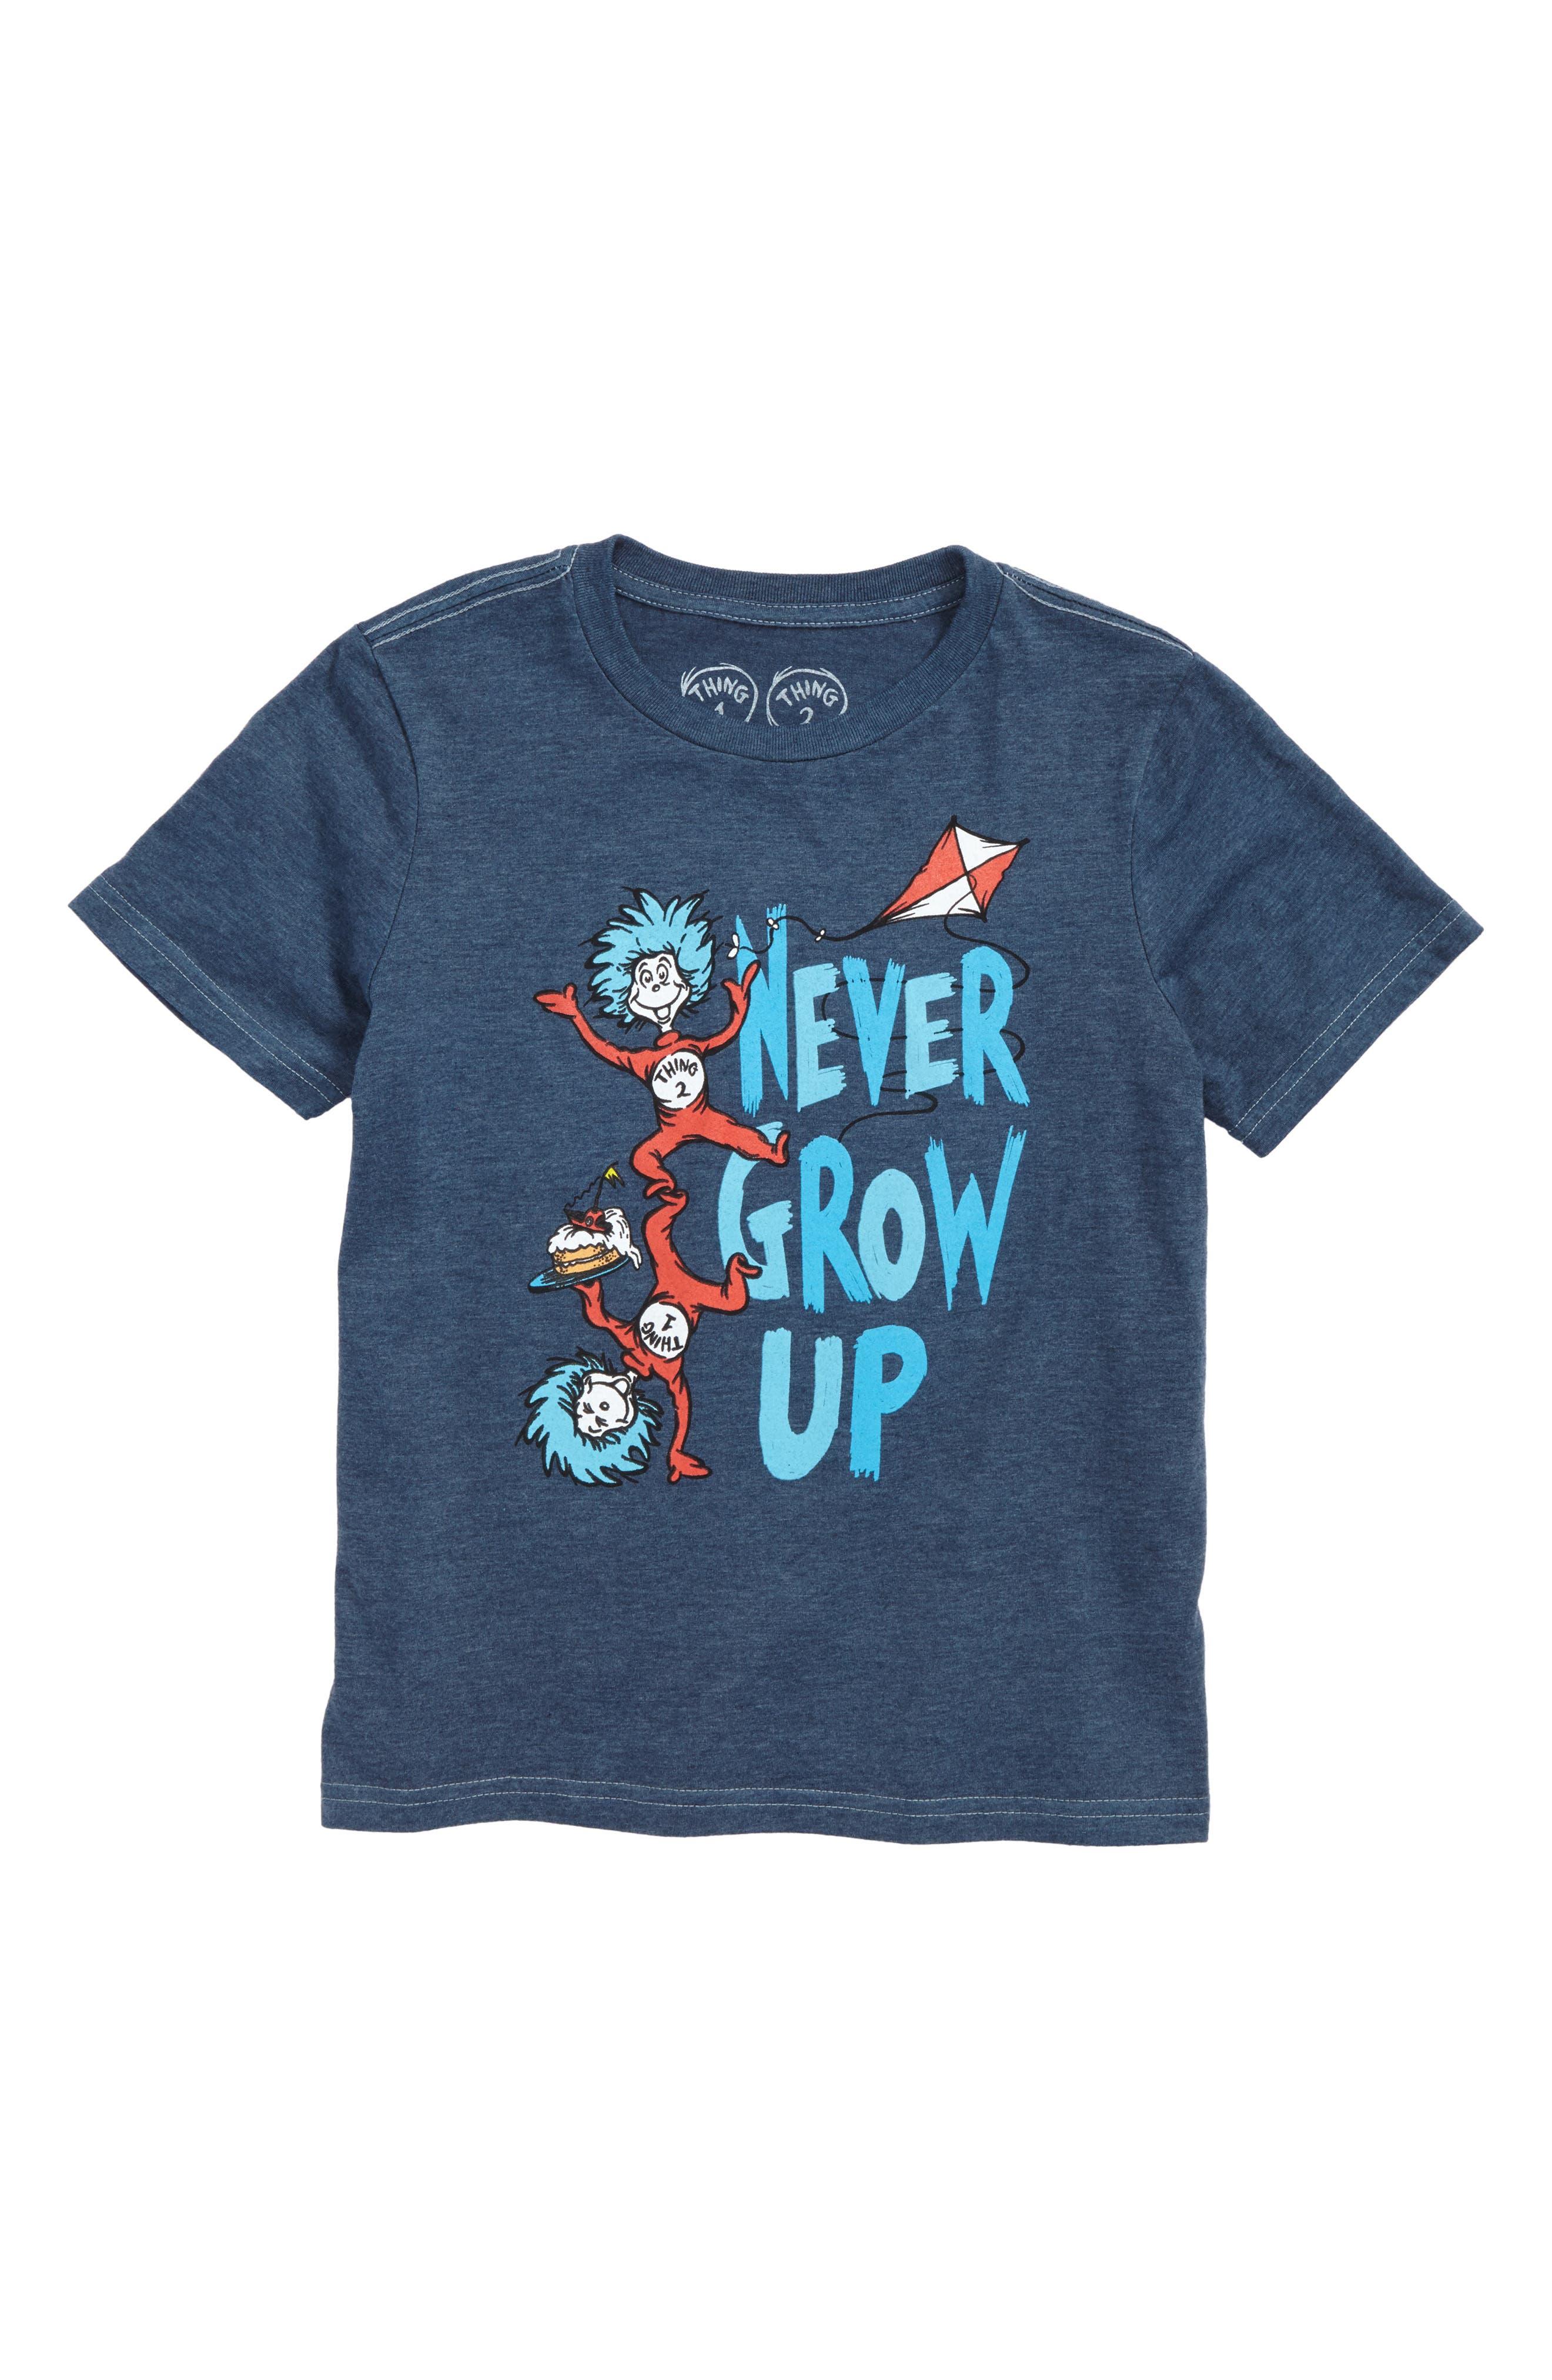 x Dr. Seuss Never Grow Up Graphic T-Shirt,                             Main thumbnail 1, color,                             Blue